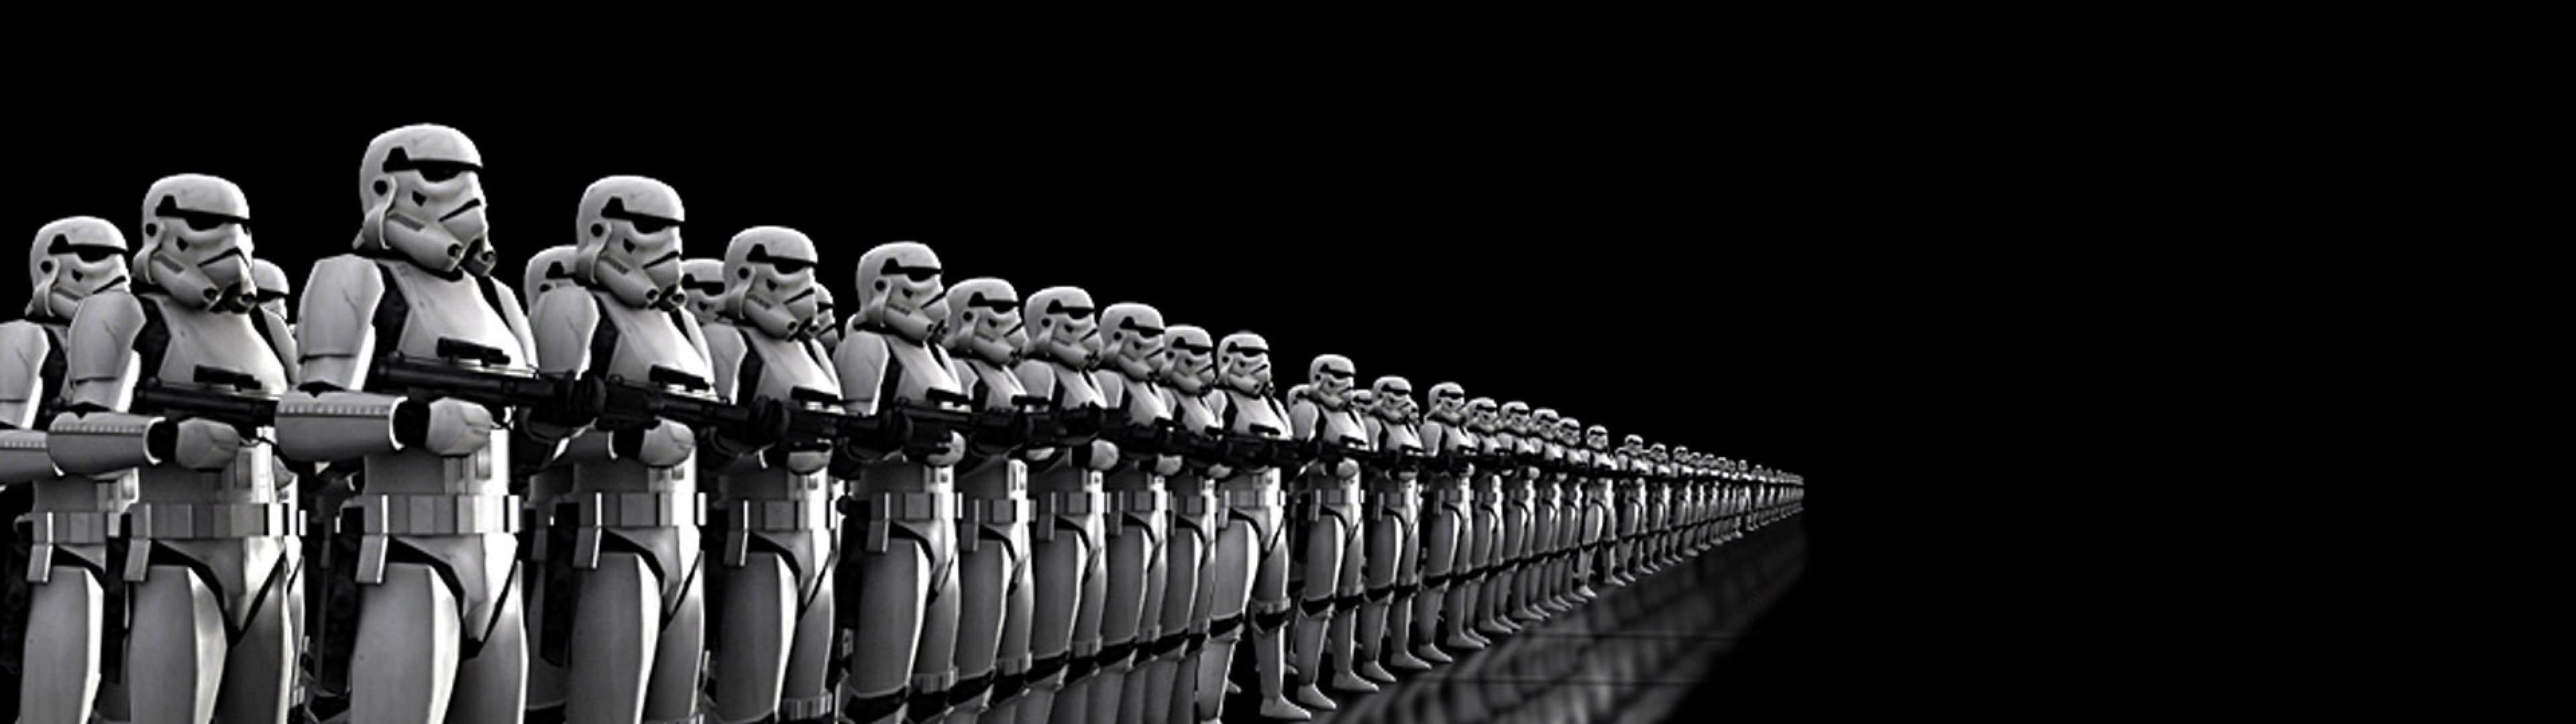 3840x1080 Wallpaper Star Wars Wallpapersafari